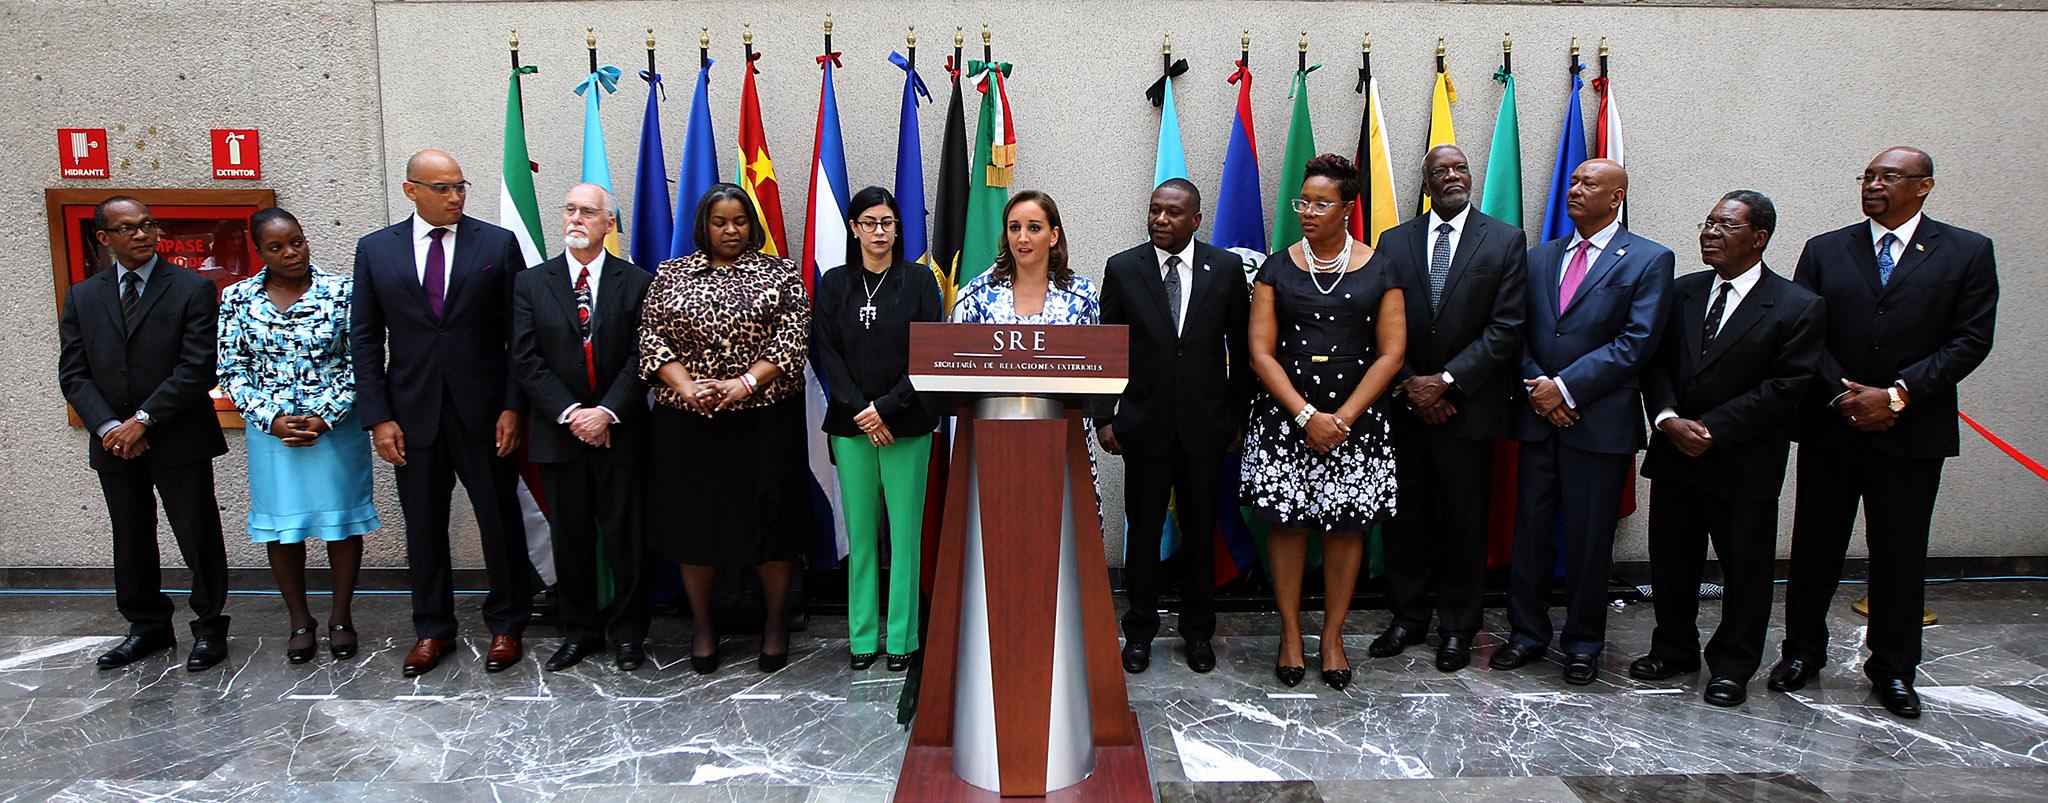 FOTO 1 La canciller Claudia Ruiz Massieu inaugur  oficina para embajadas concurrentes del Caribe.jpg